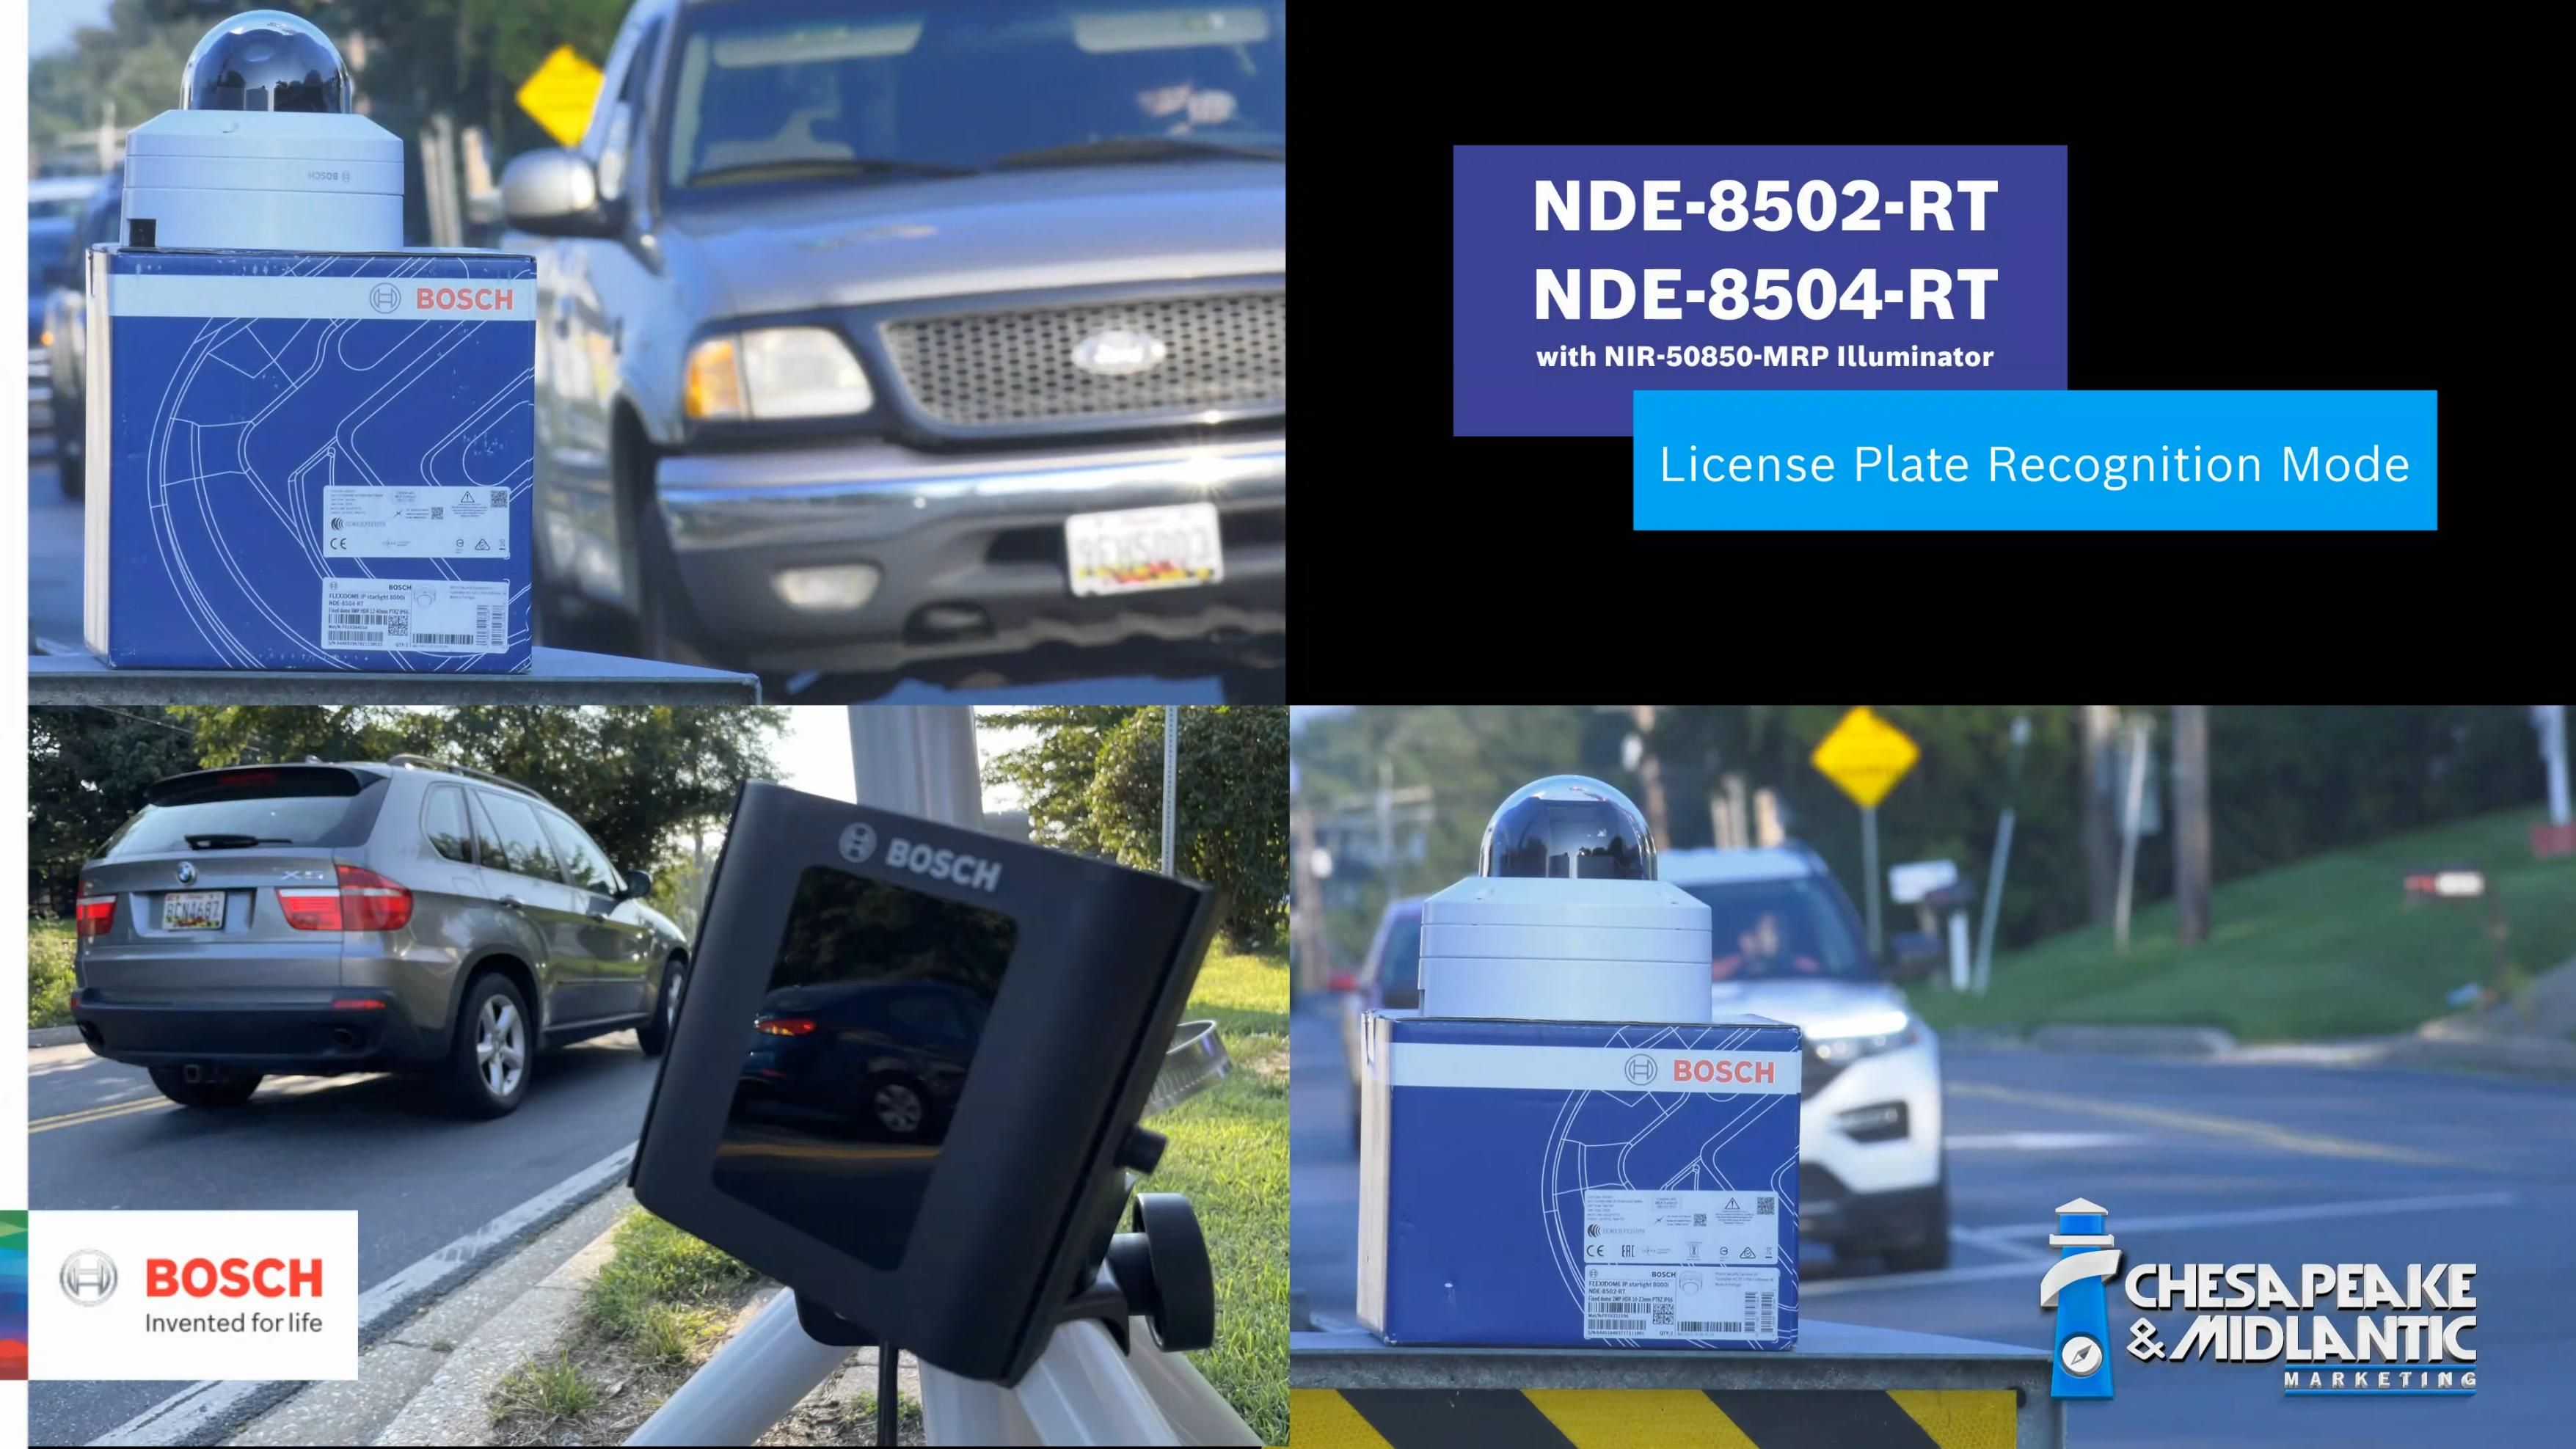 Bosch NDE-8502-RT and NDE-8504-RT with  NIR-50850-MRP LPR Mode Demonstration thumbnail